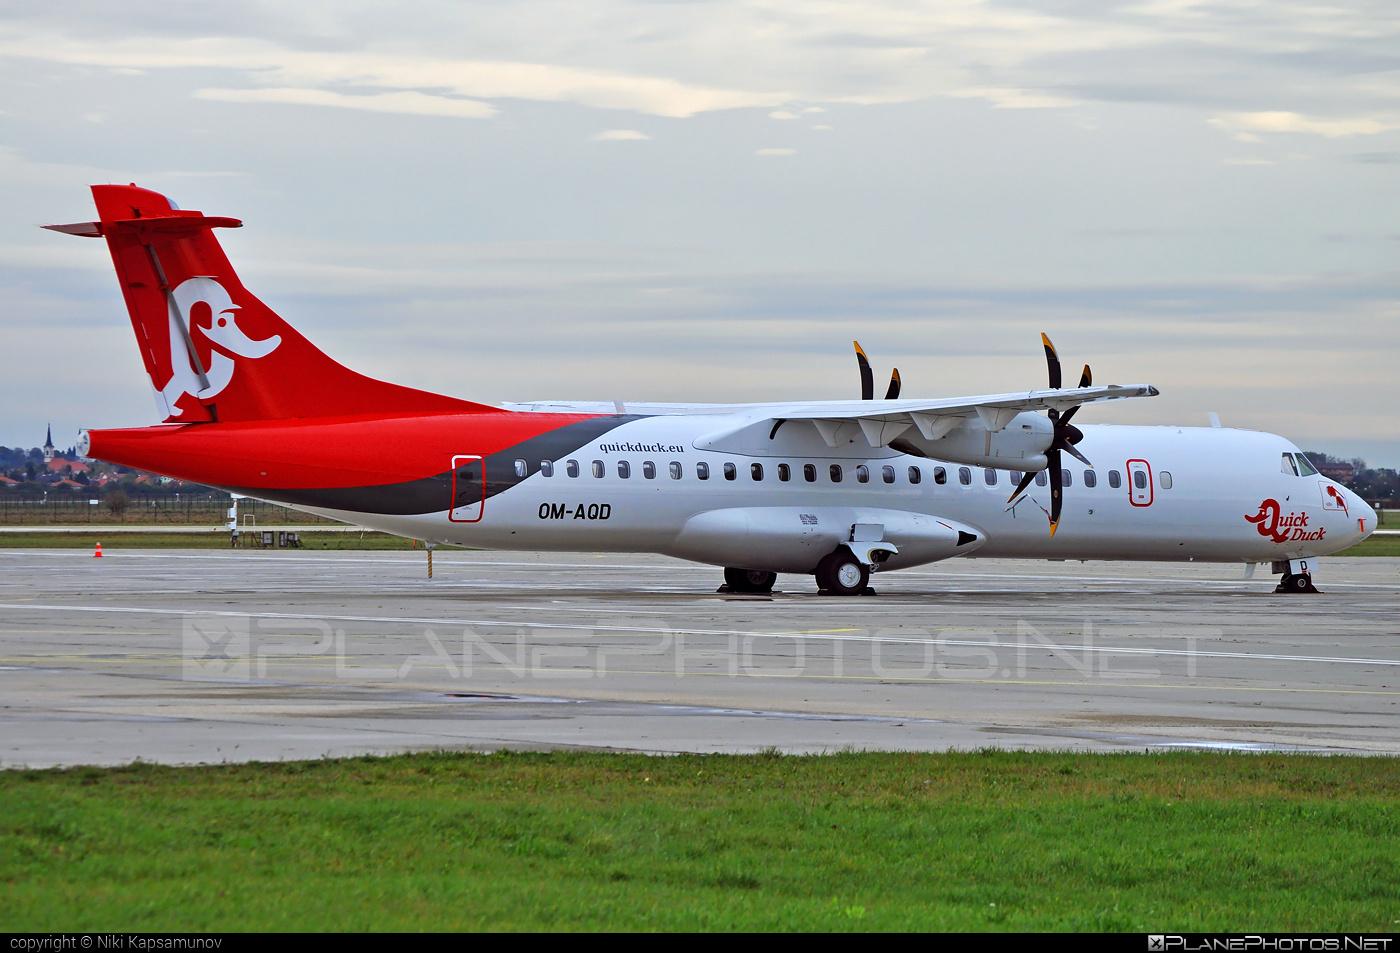 ATR 72-600 - OM-AQD operated by Quick Duck #atr